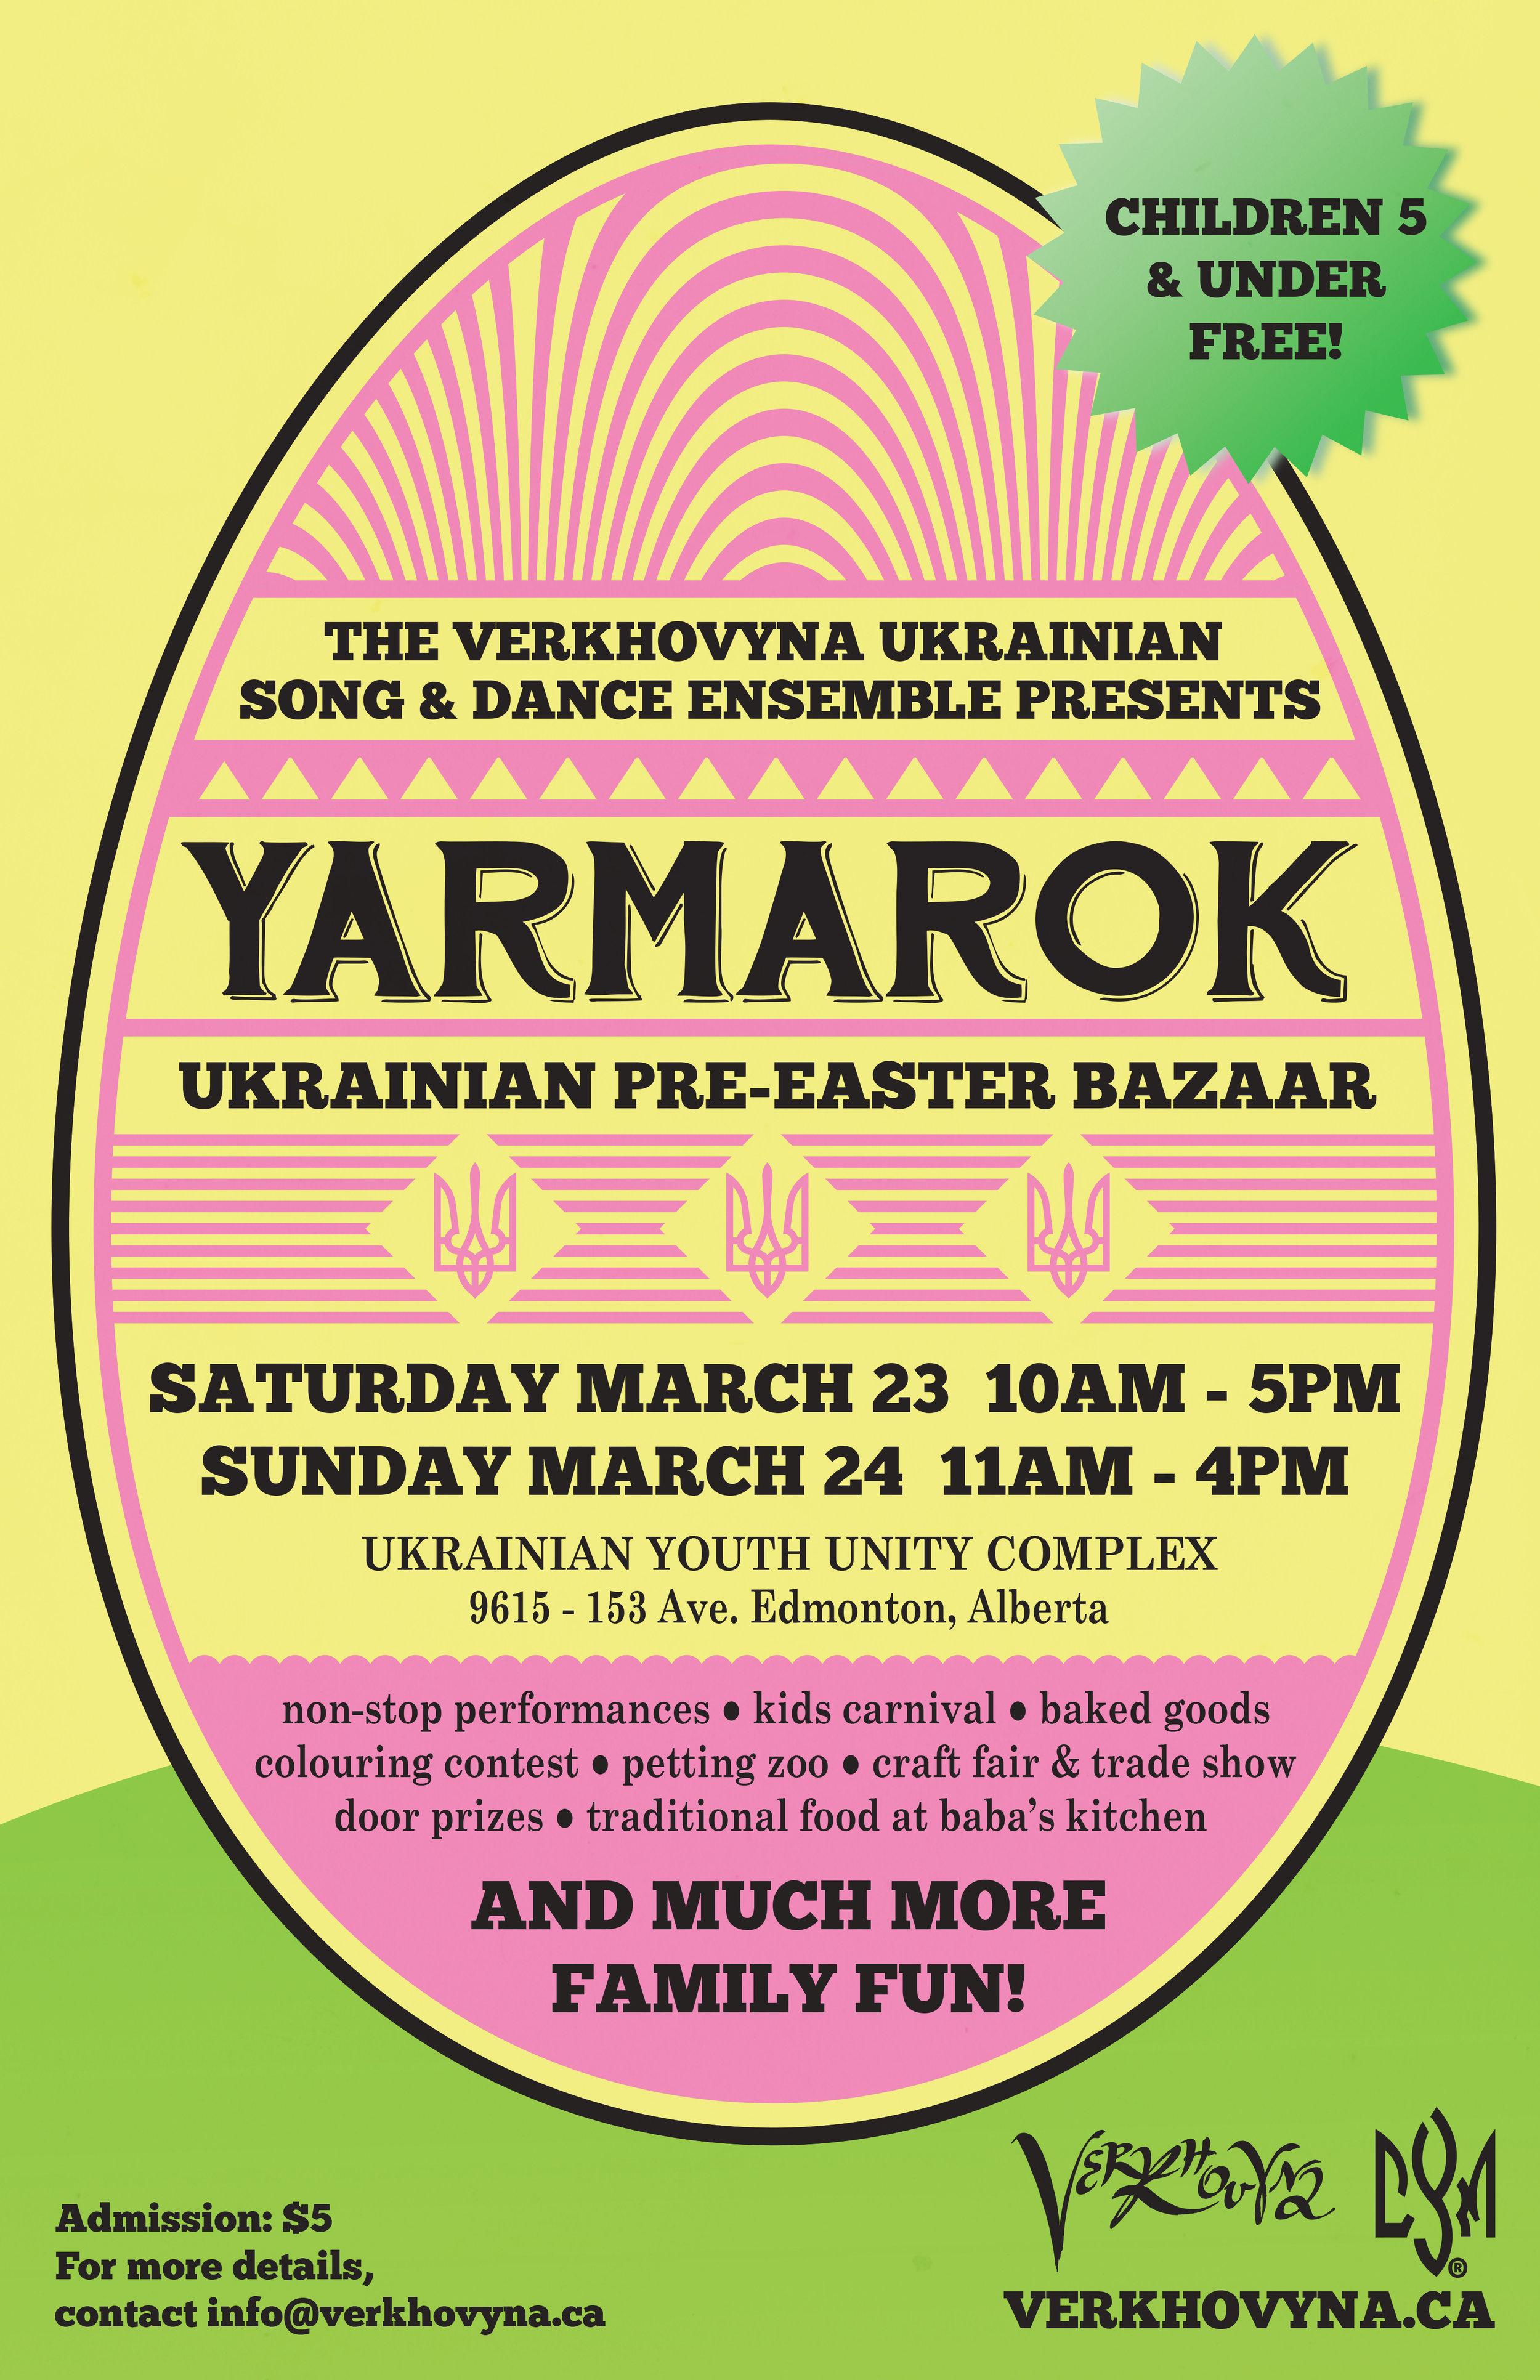 yarmarok-2019-poster-feb22.jpg